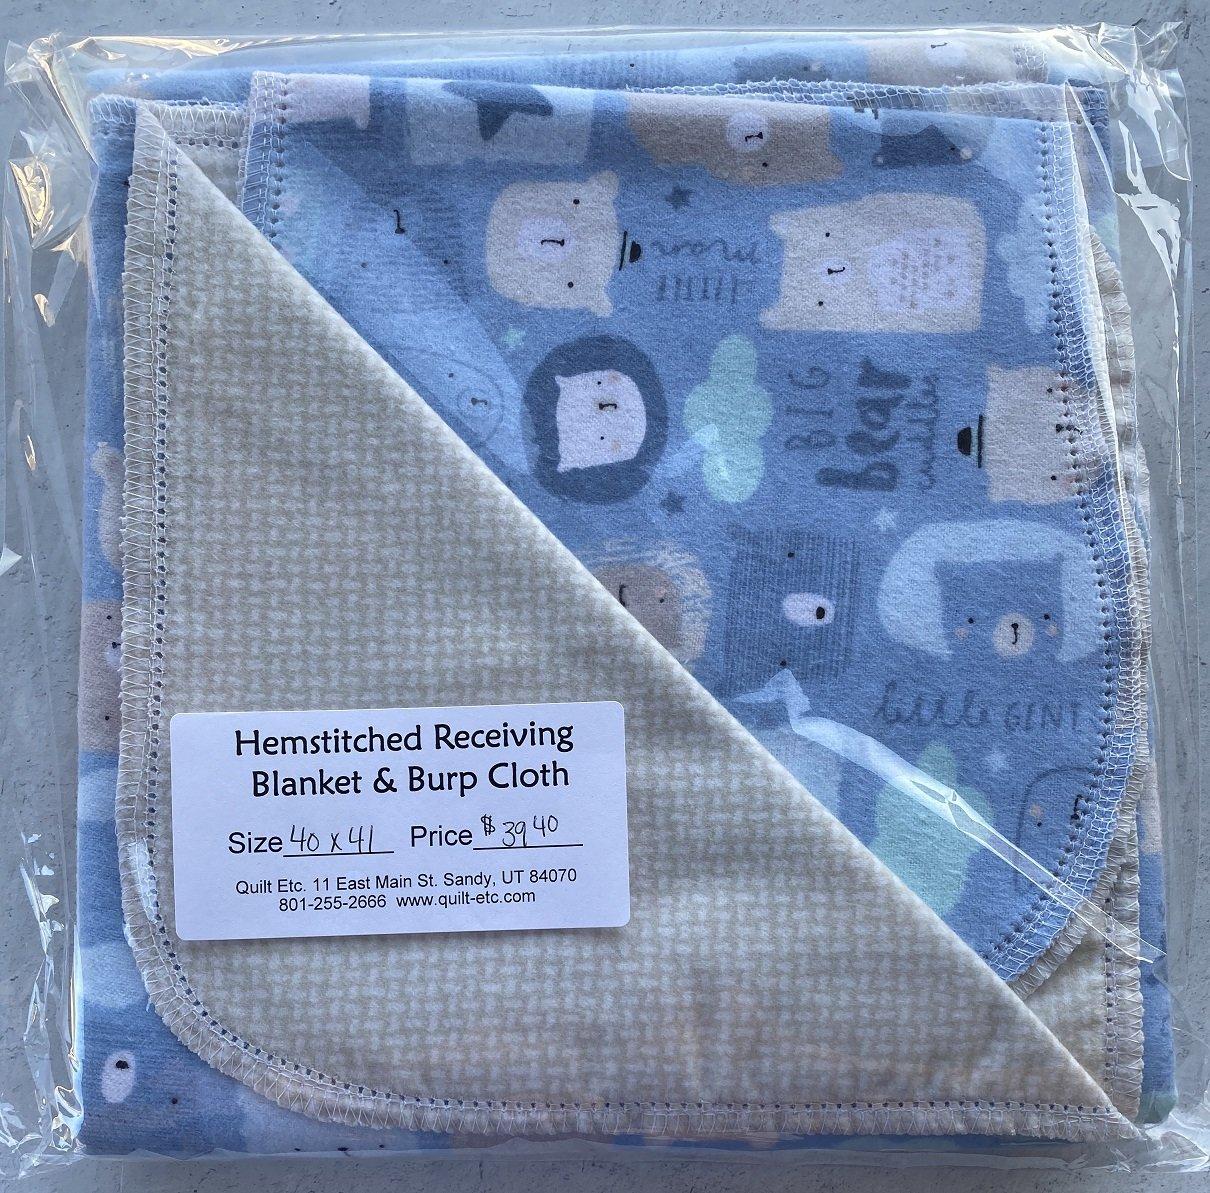 Hemstitched Receiving Blanket & Burp Cloth 3